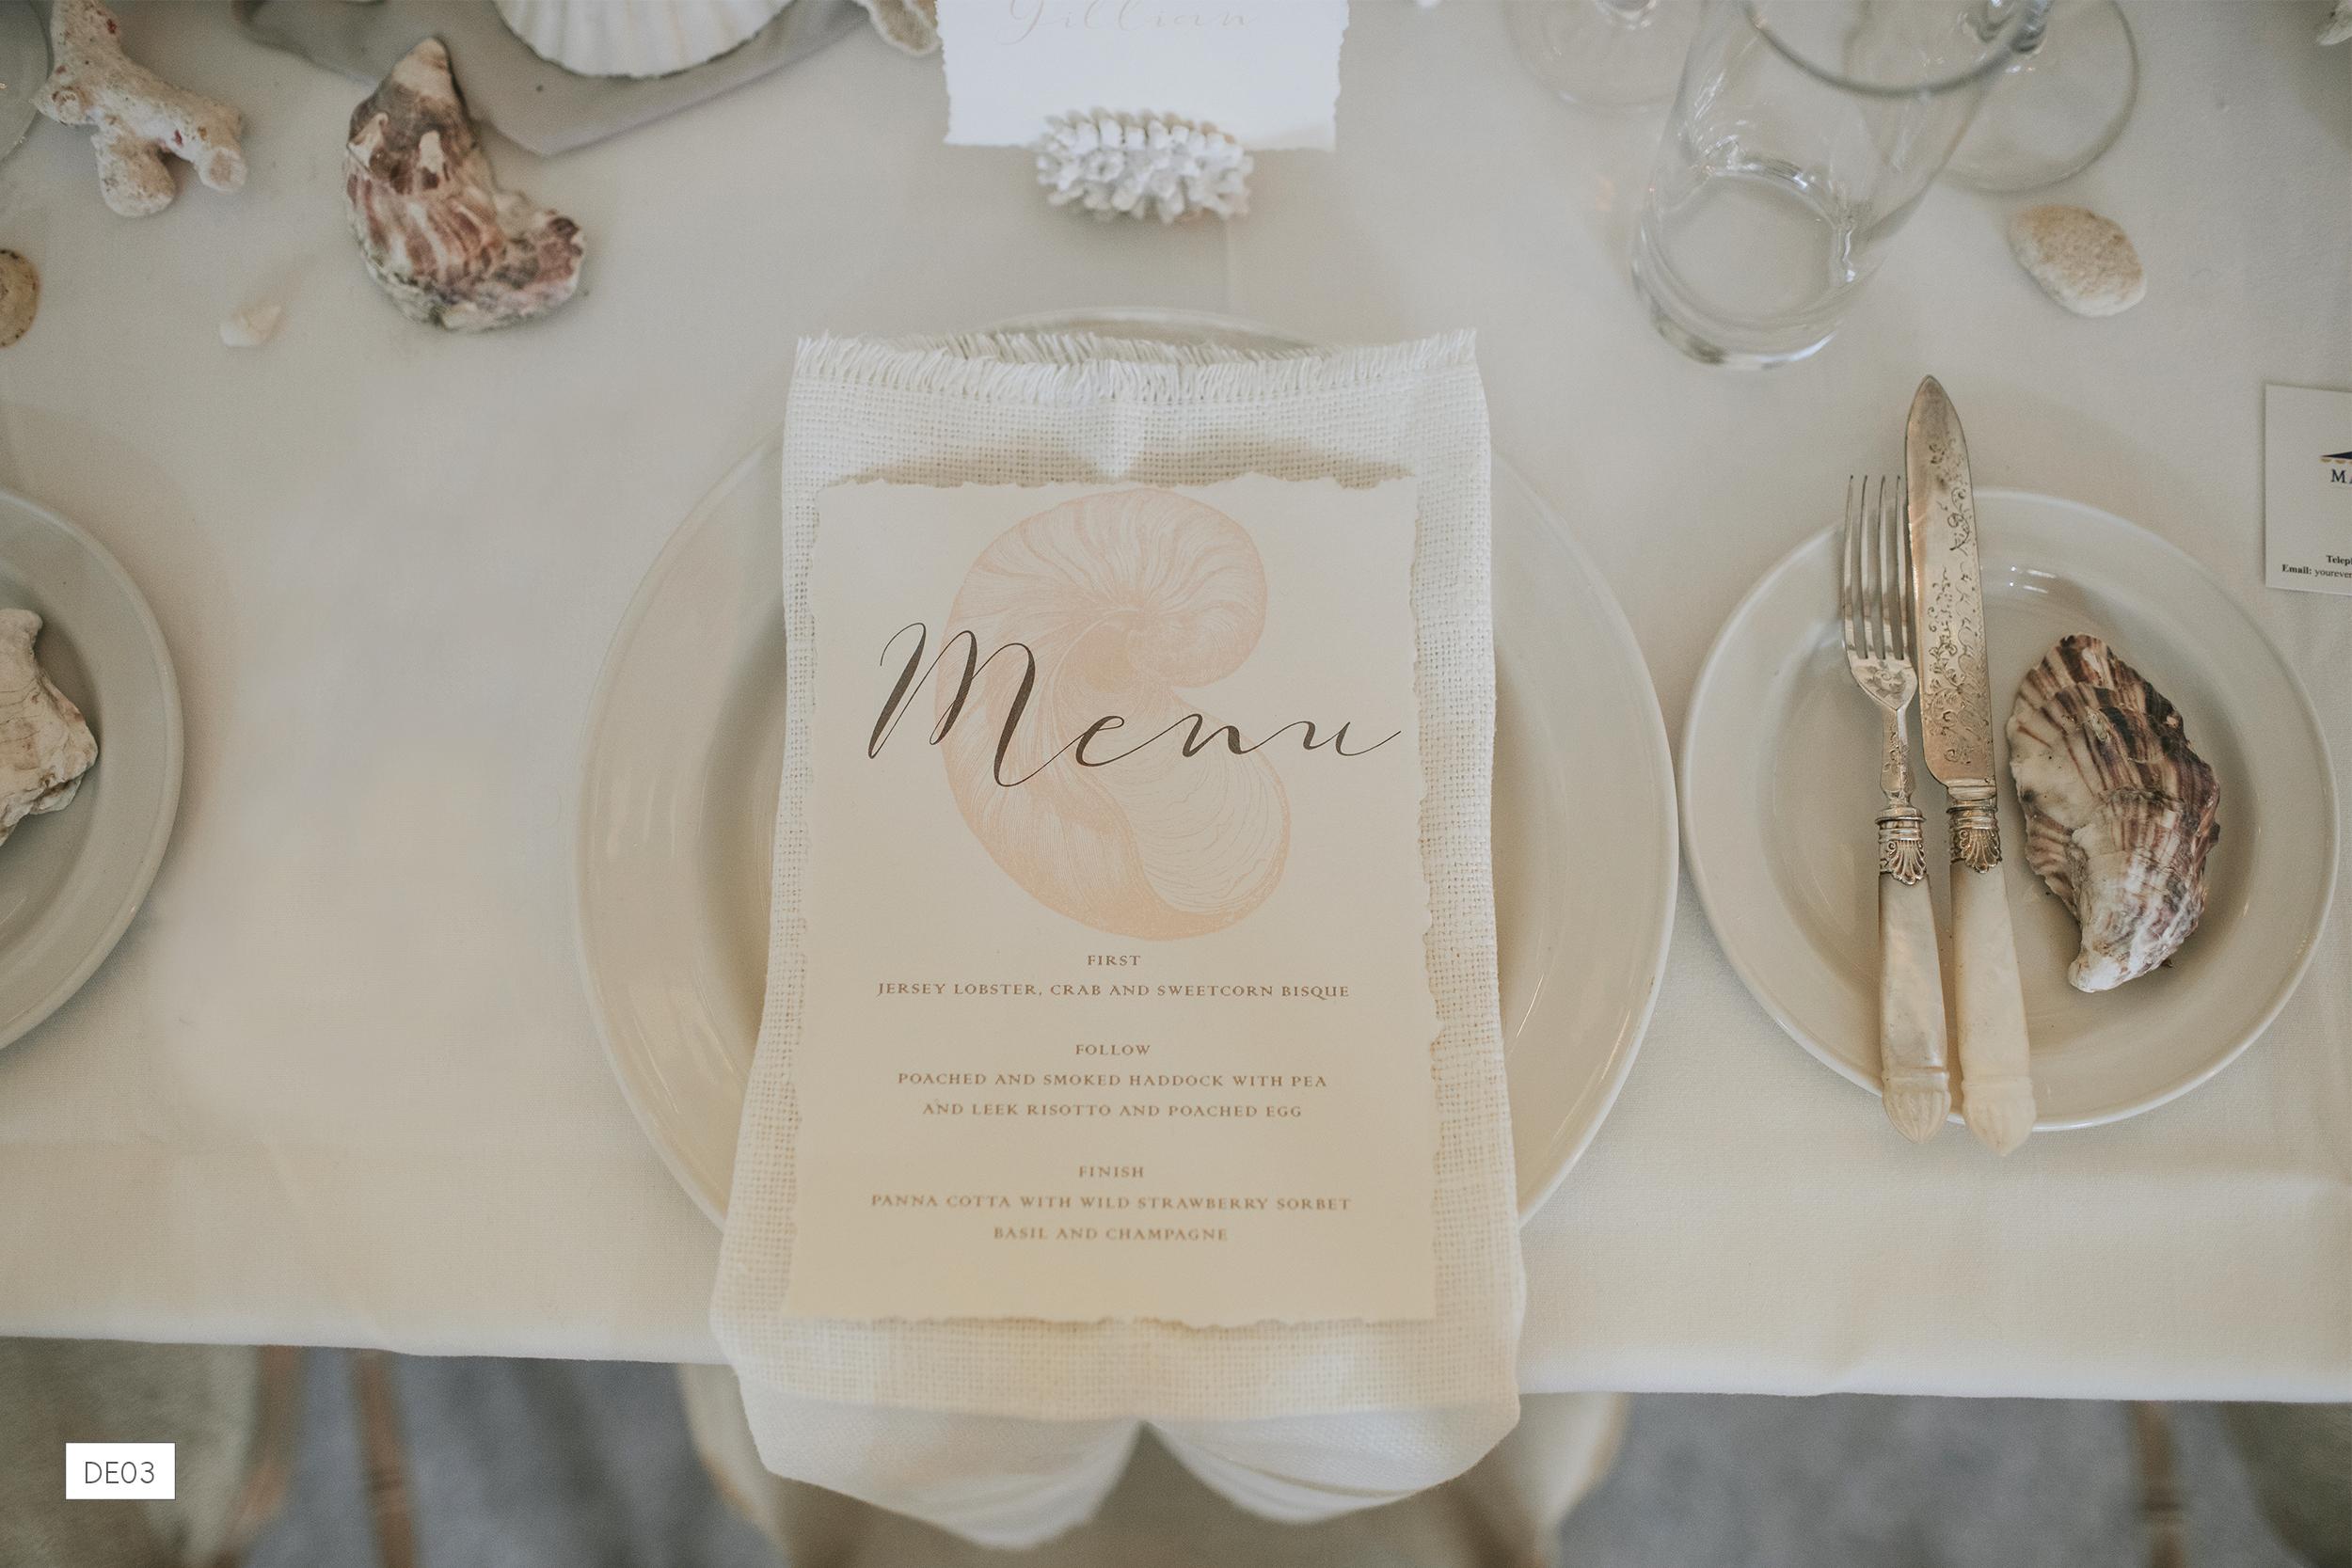 DE03-Destination-Weddings2-JerseyShell_ananyacards.com.jpg